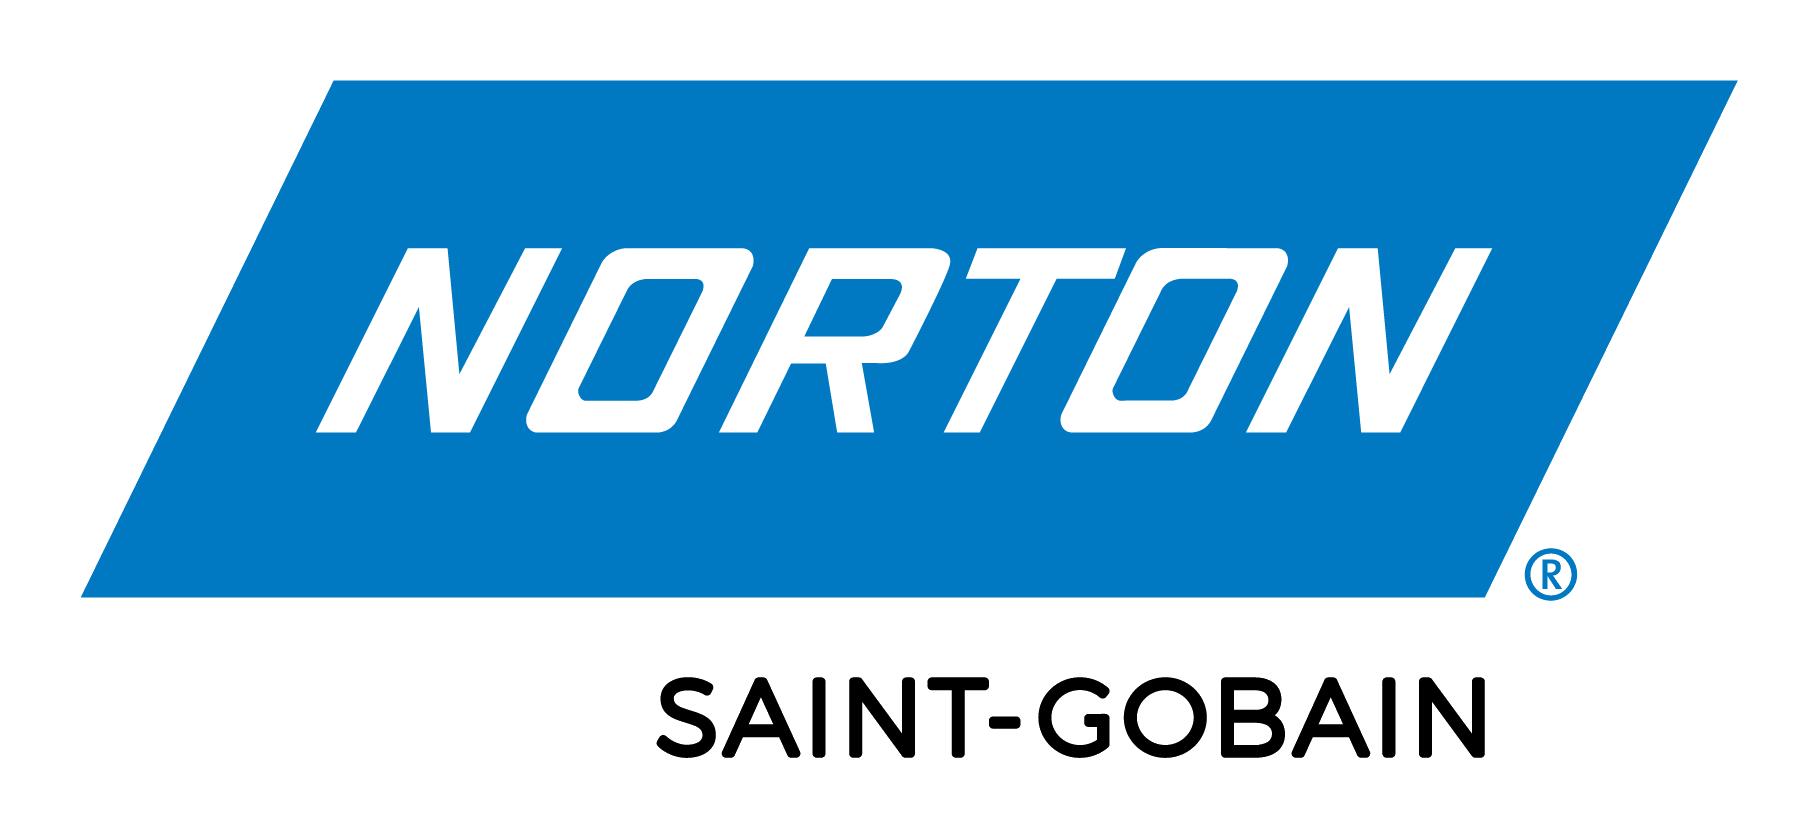 SG_Norton_logo_rgb_19